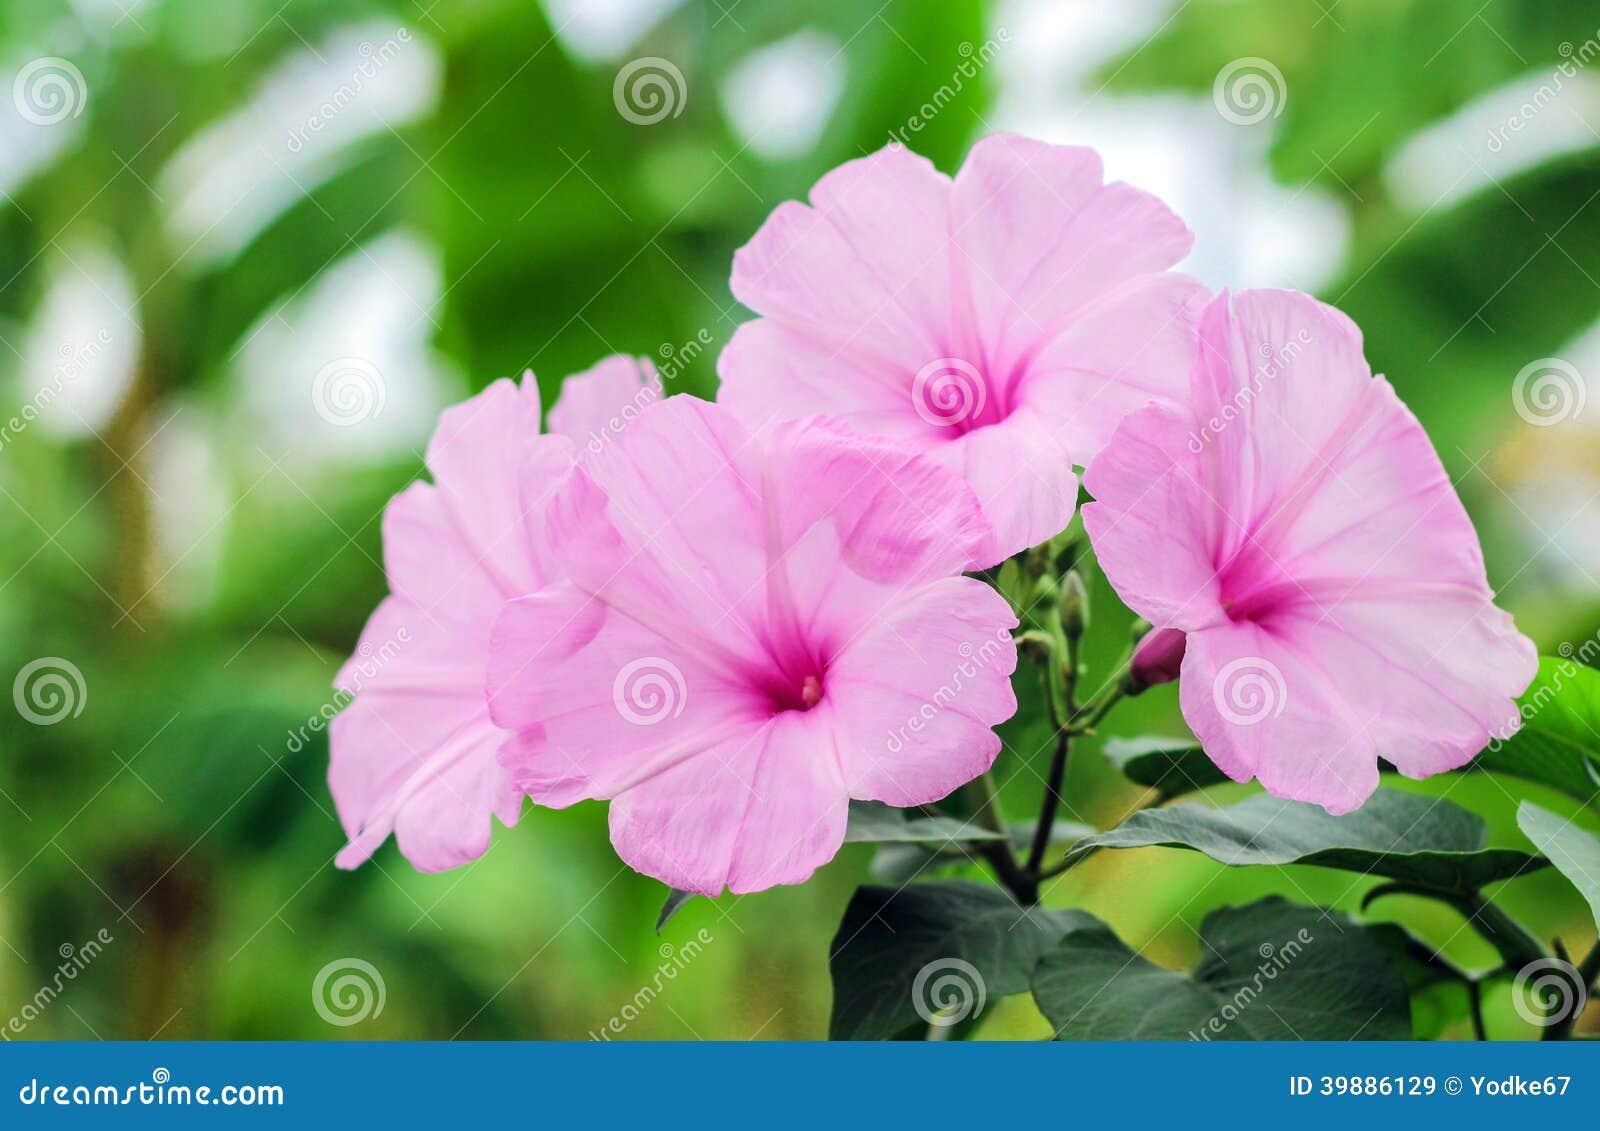 Pink Morning Glory Beautiful Flowers Stock Image Image Of Morning